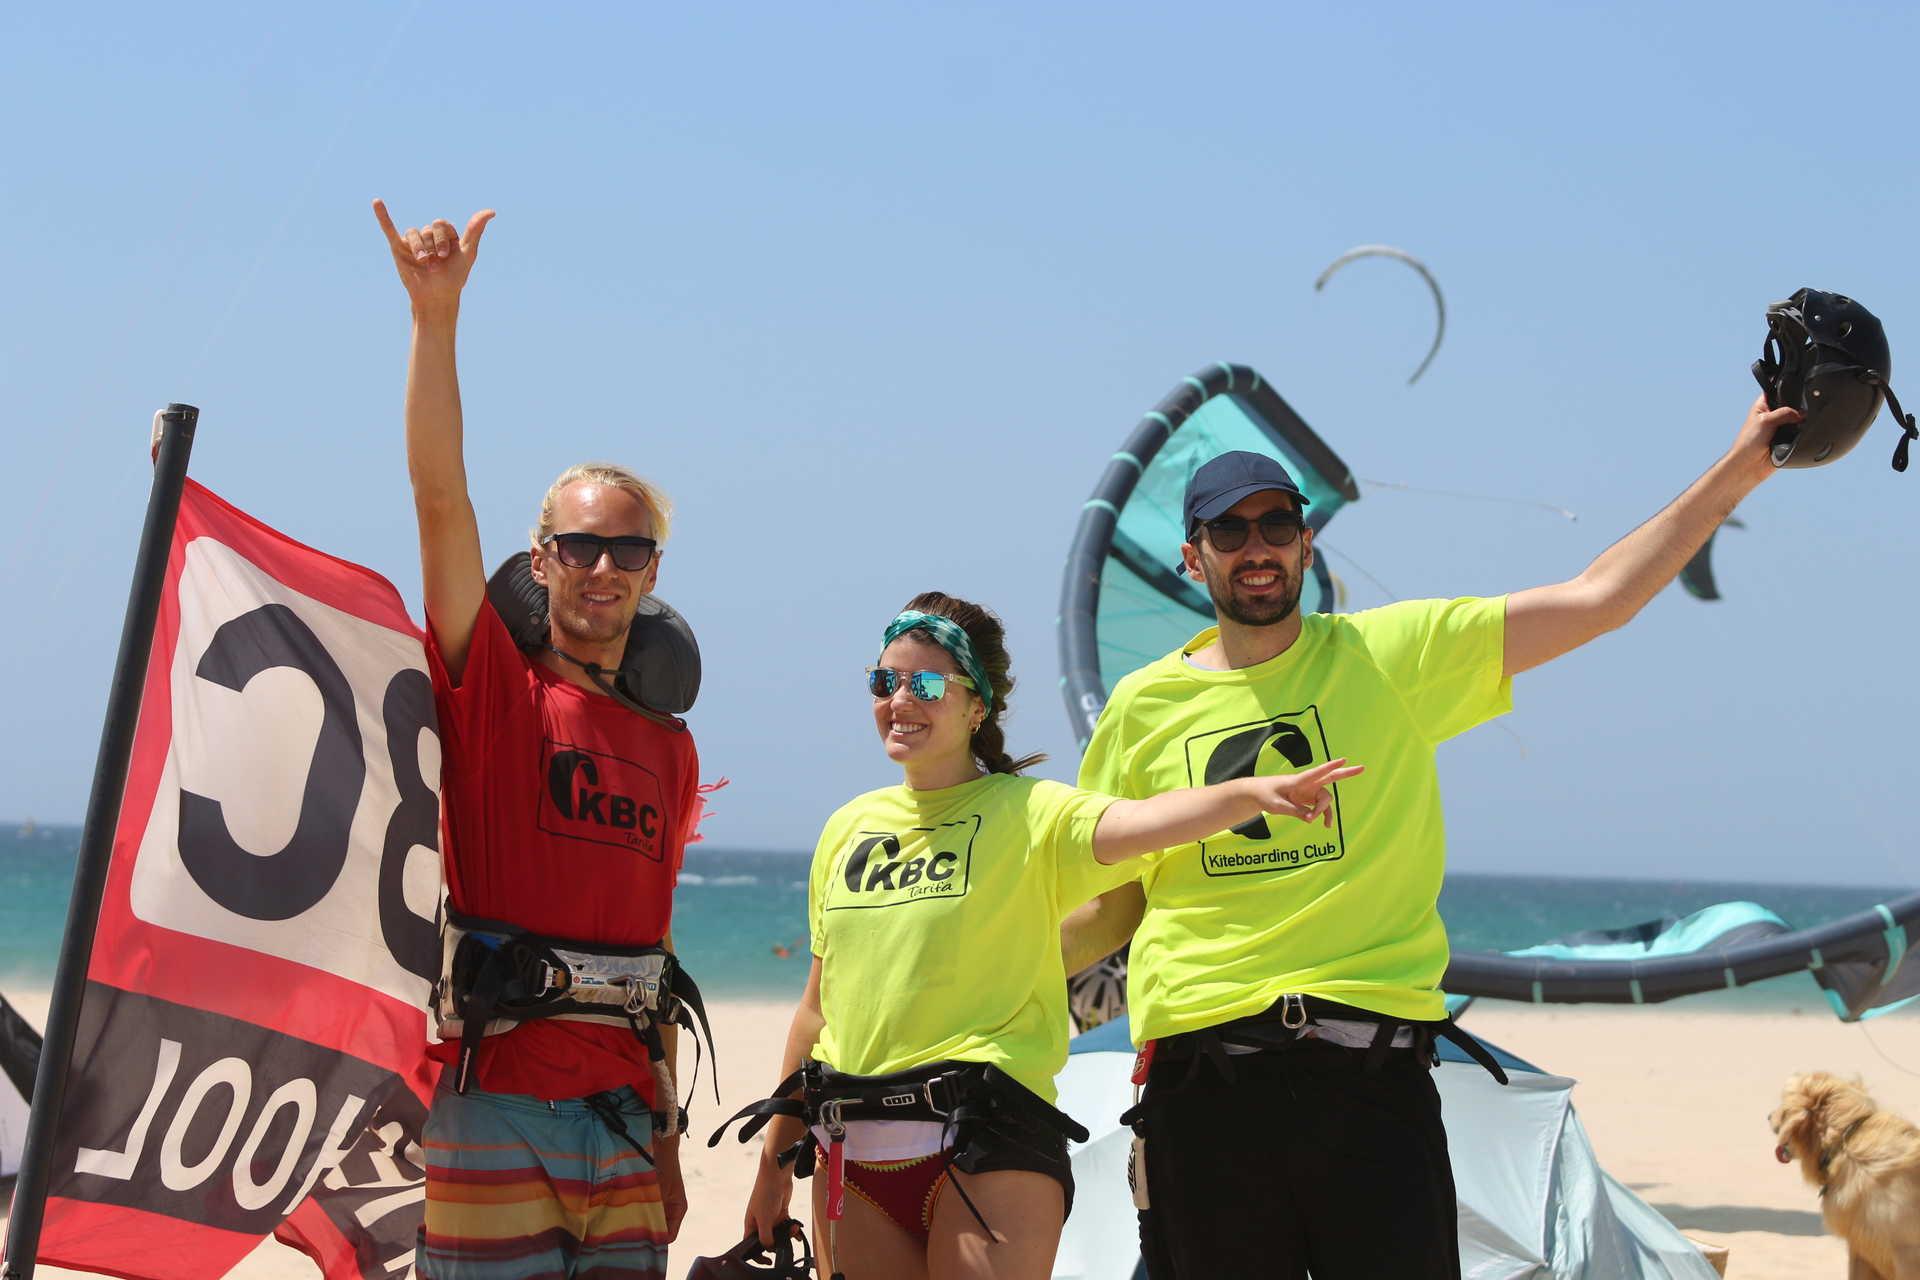 Kiteboarding Club Tarifa